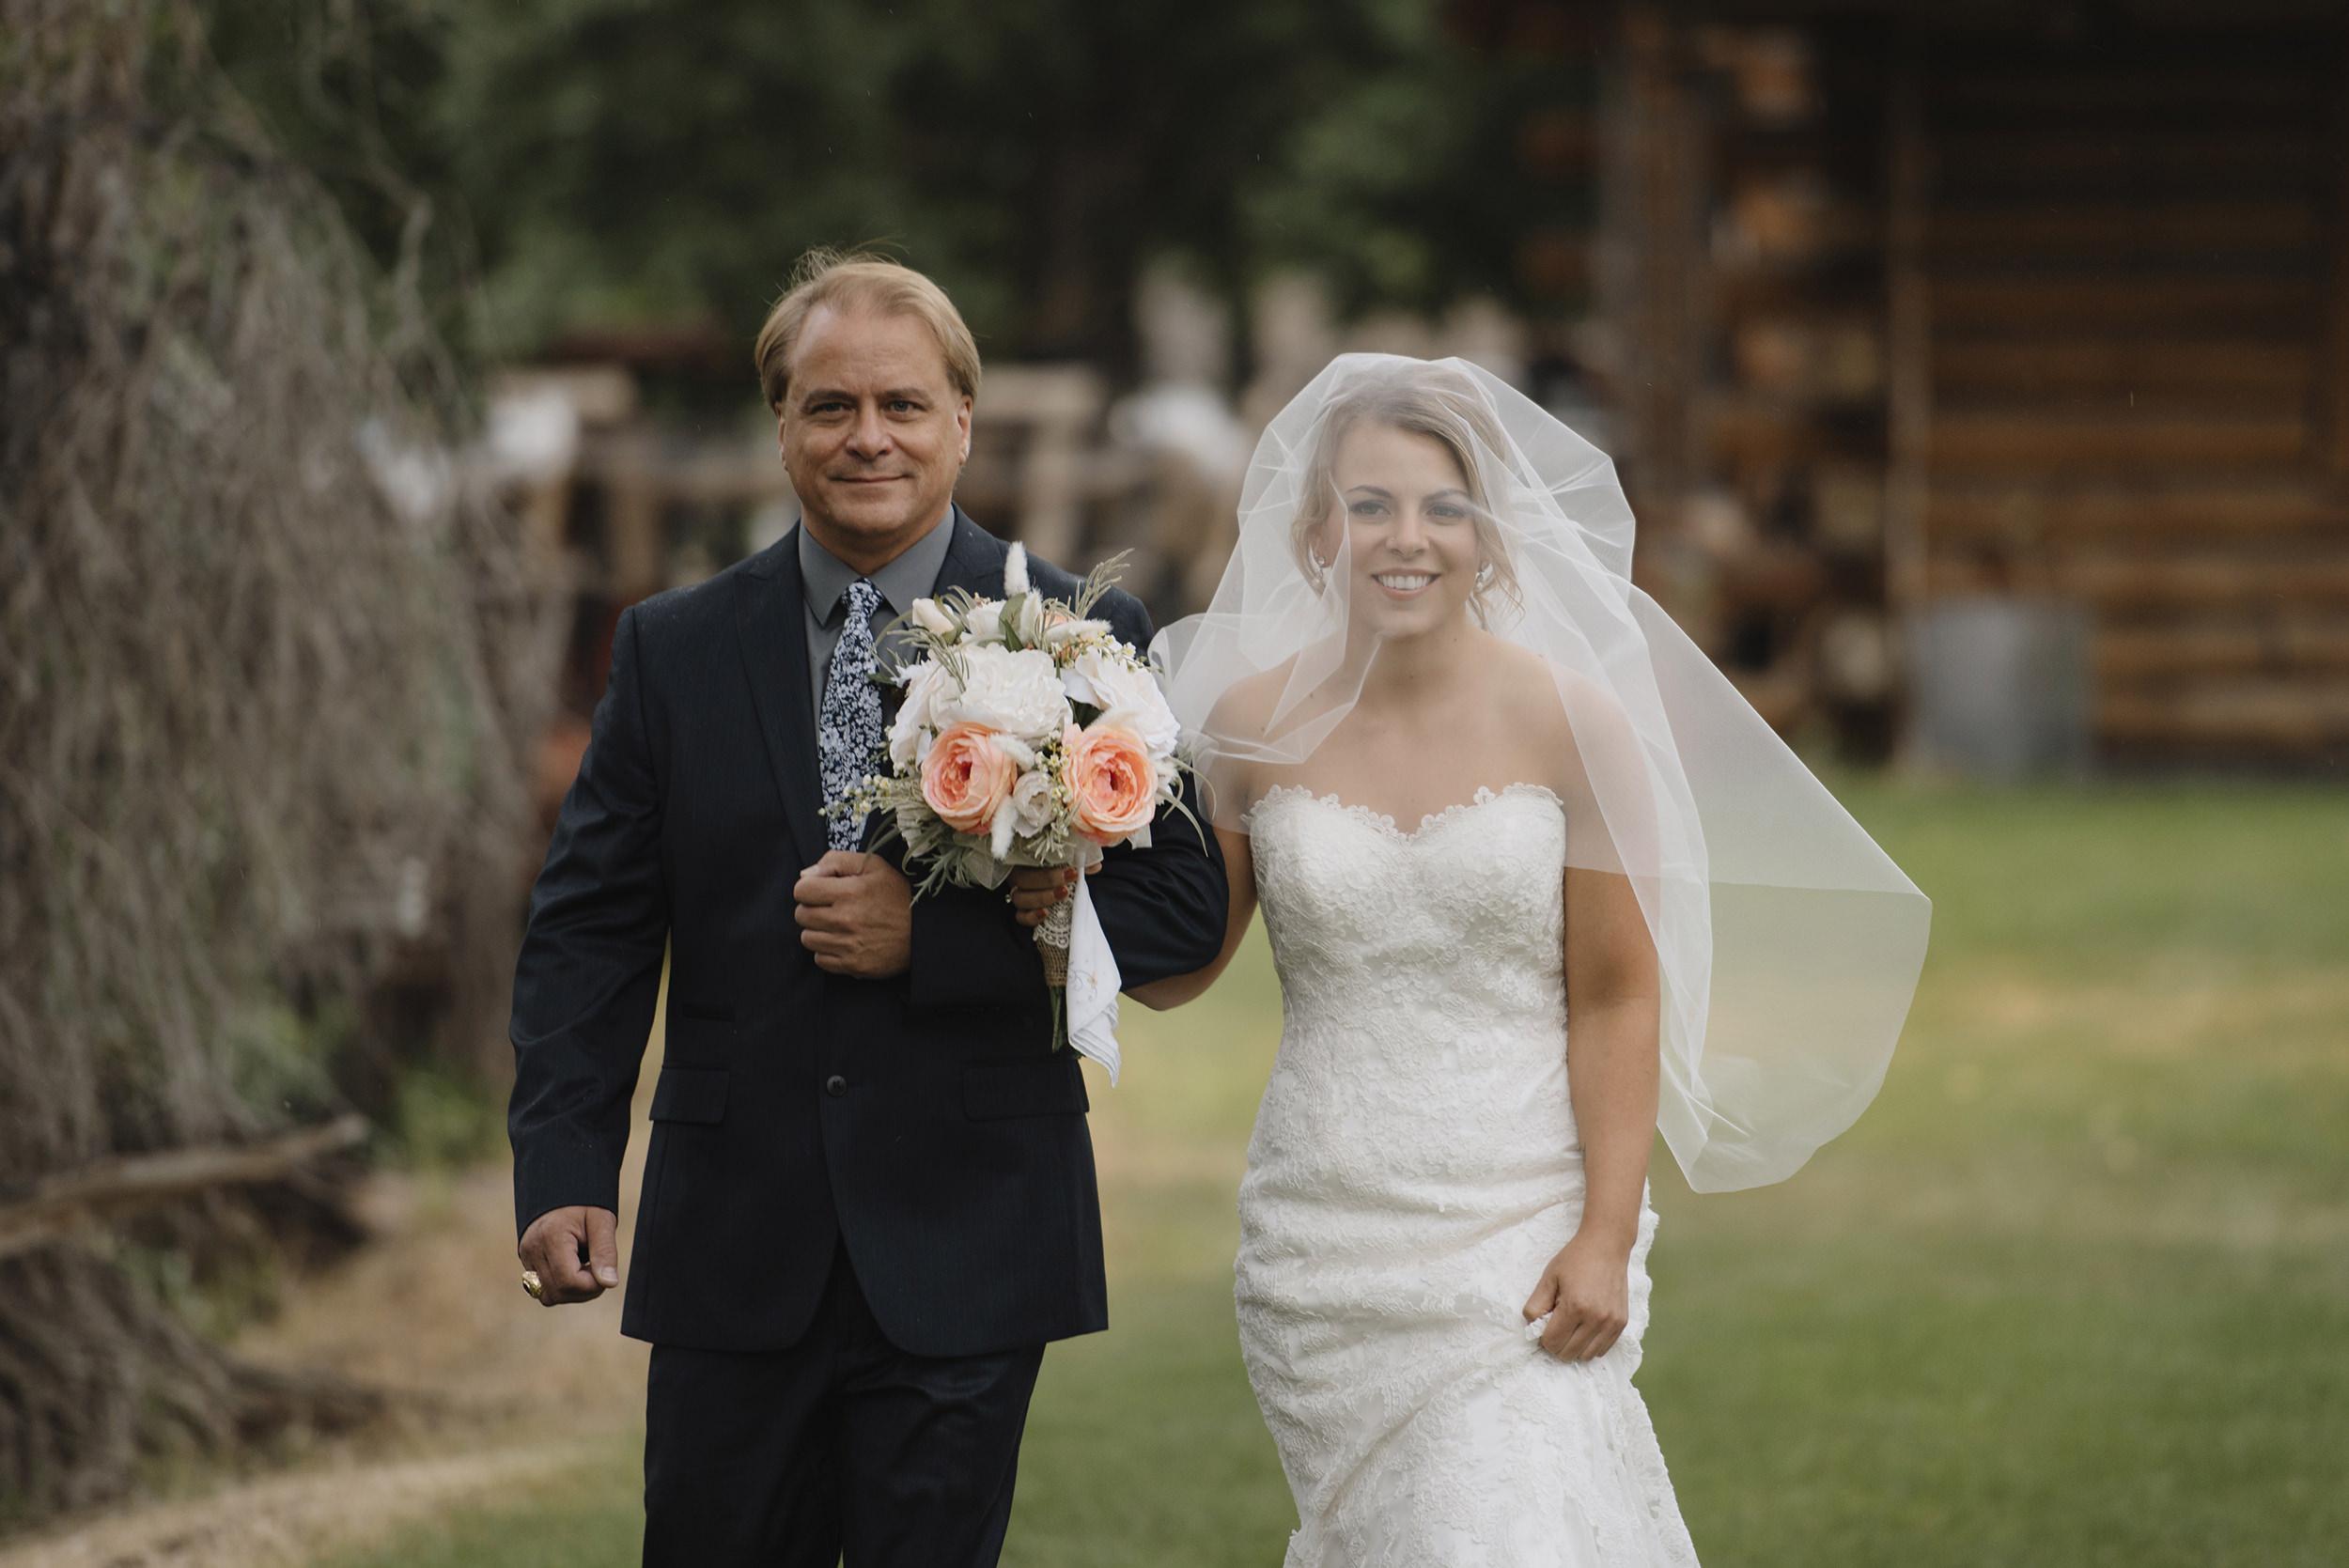 Colby-and-Jess-Intimate-Backyard-Wedding-Bozeman-Montana469.jpg